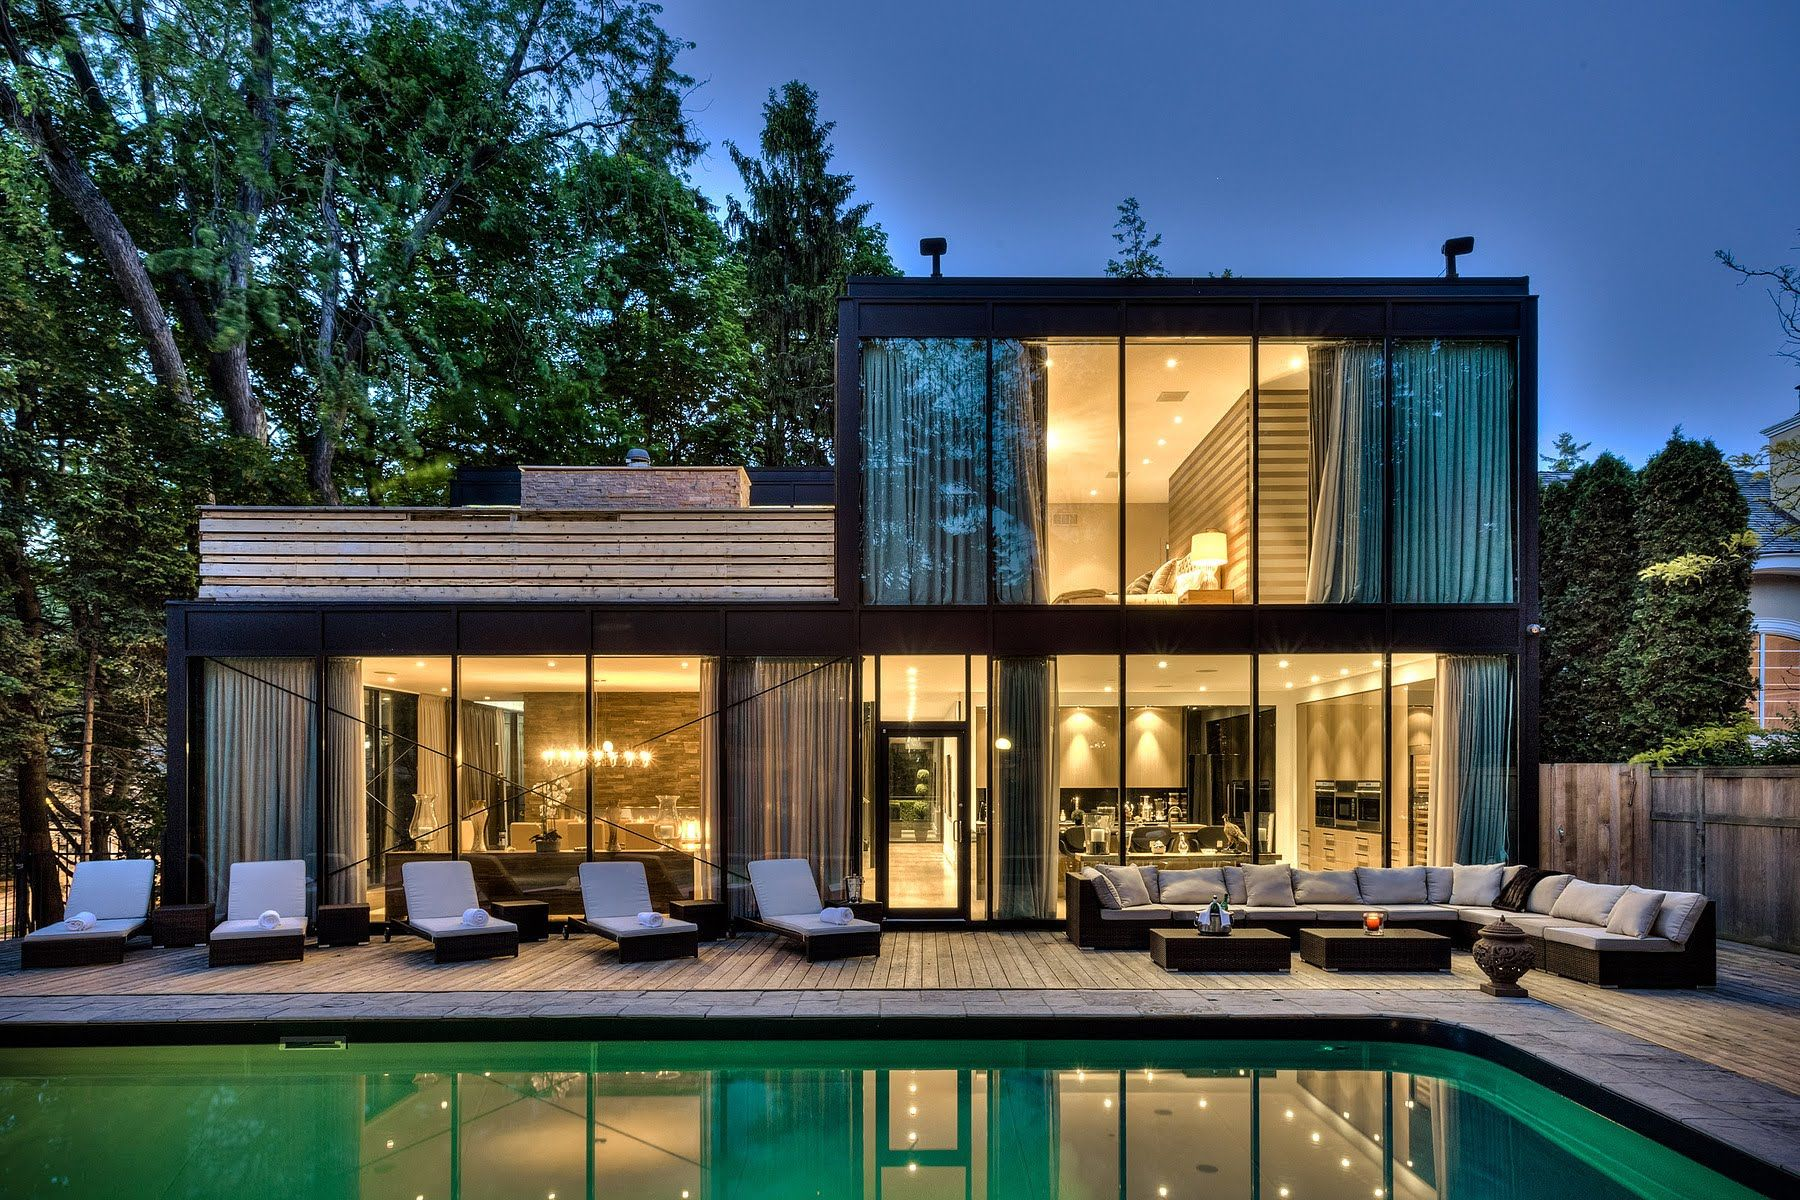 Pin By Karolina Zablotny On Dream House Glass House Design Glass House Beach House Plans